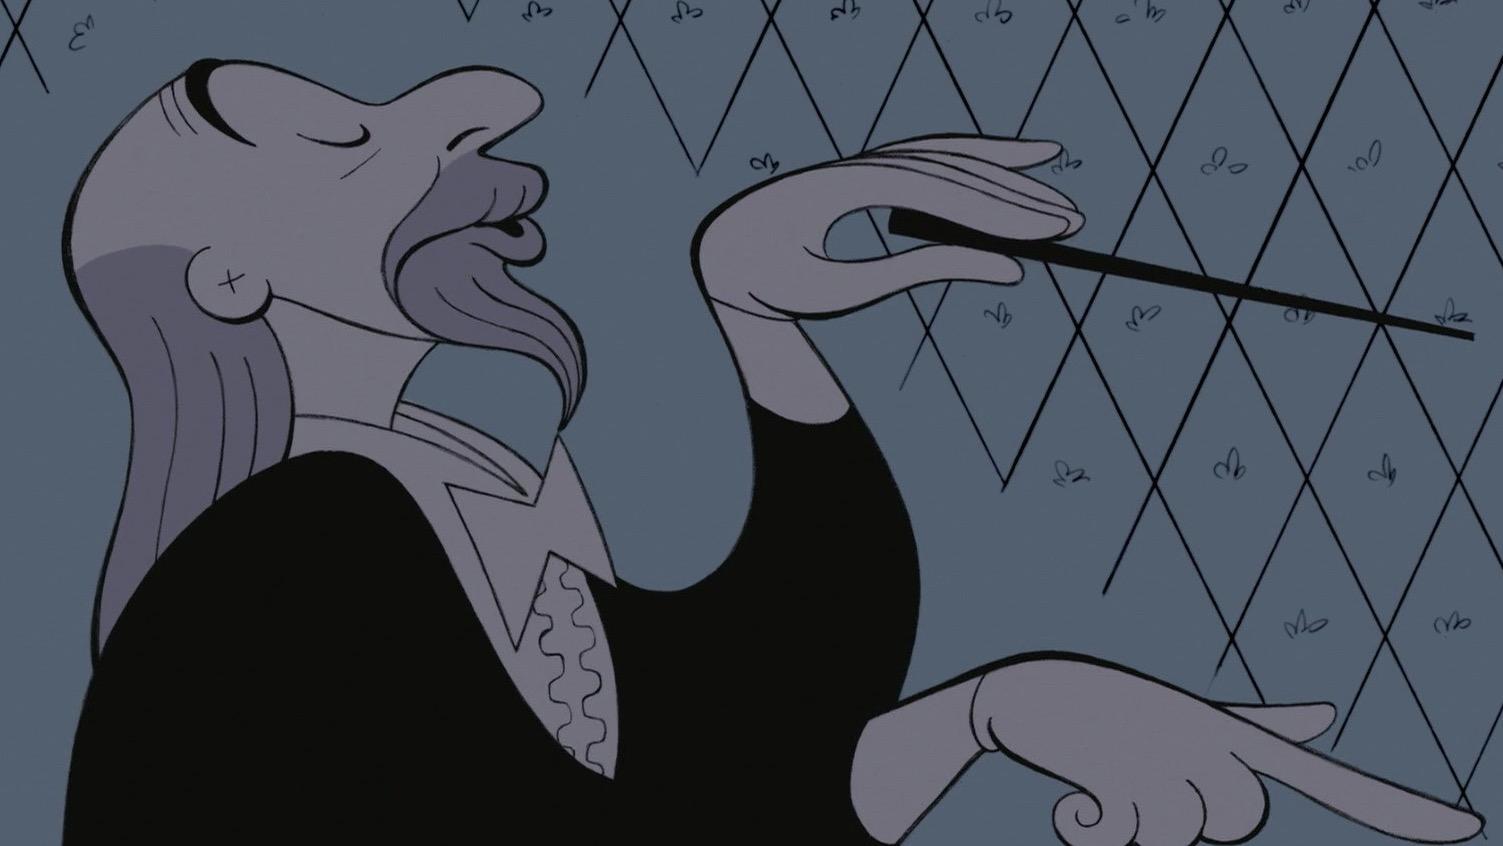 Ralph (Fantasia 2000)